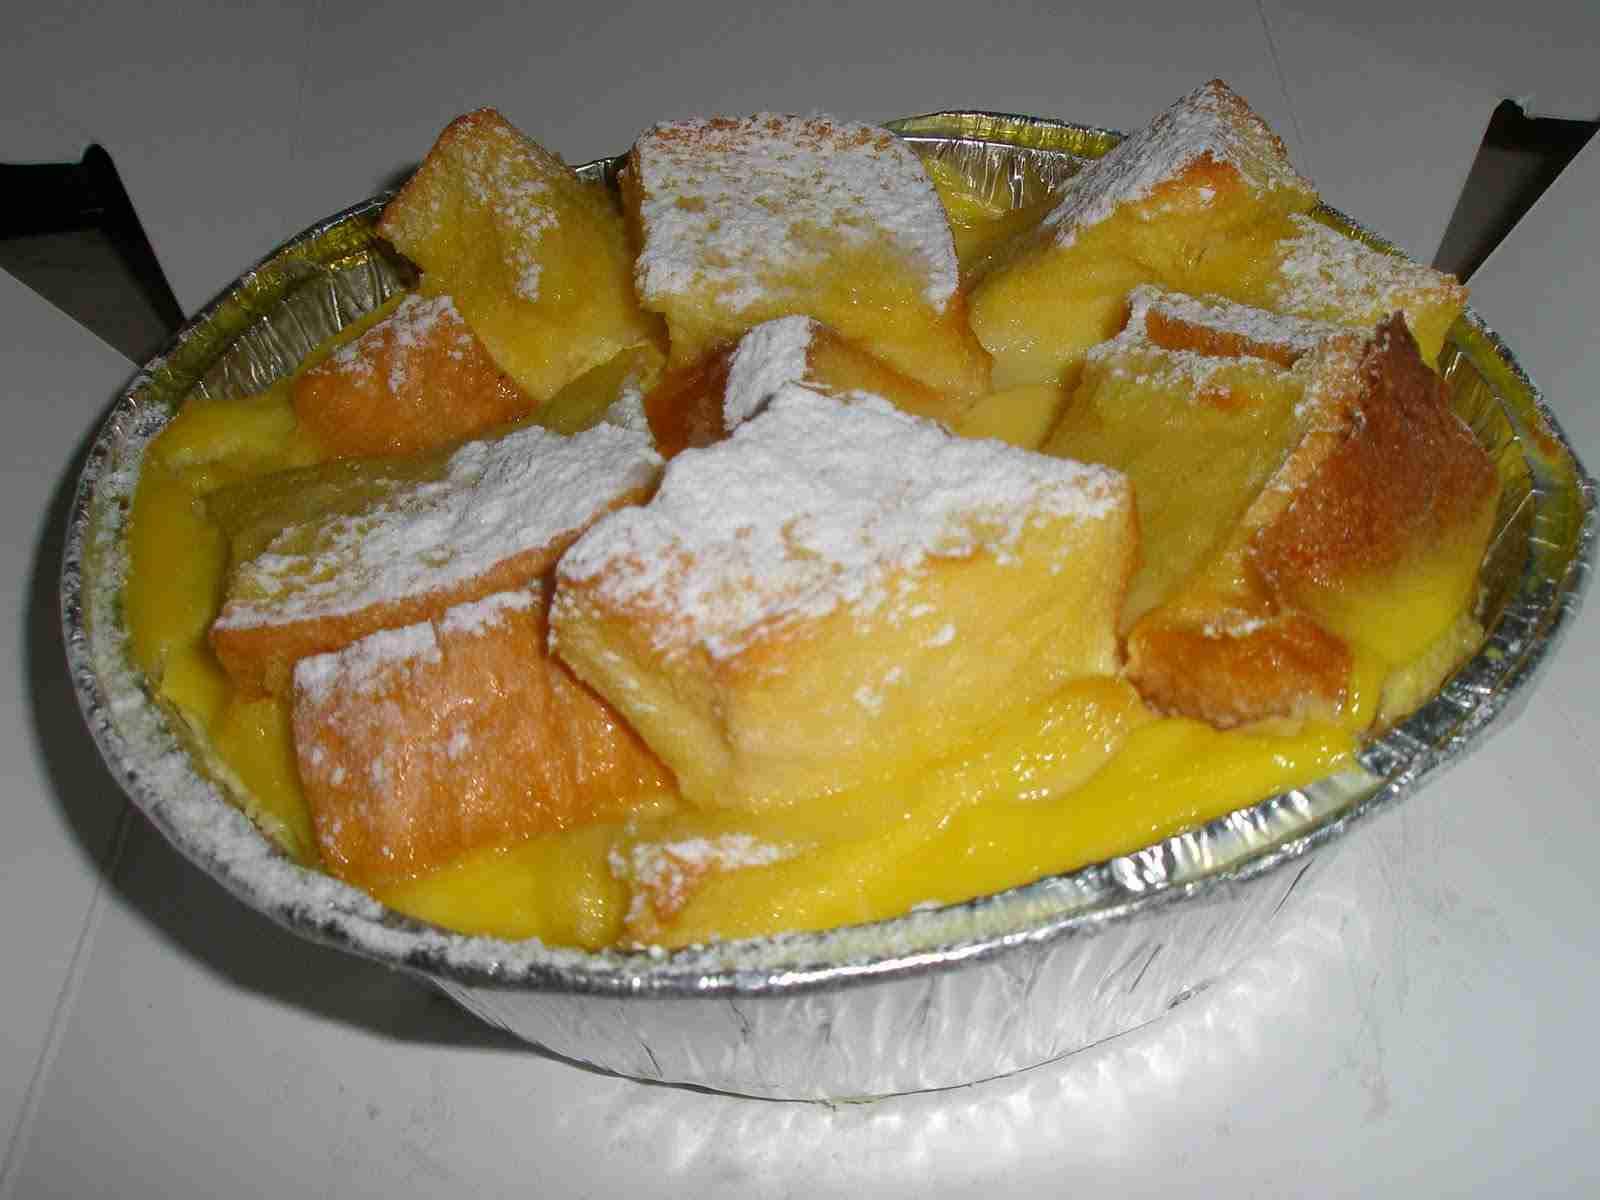 Bread Pudding and Vanilla Sauce